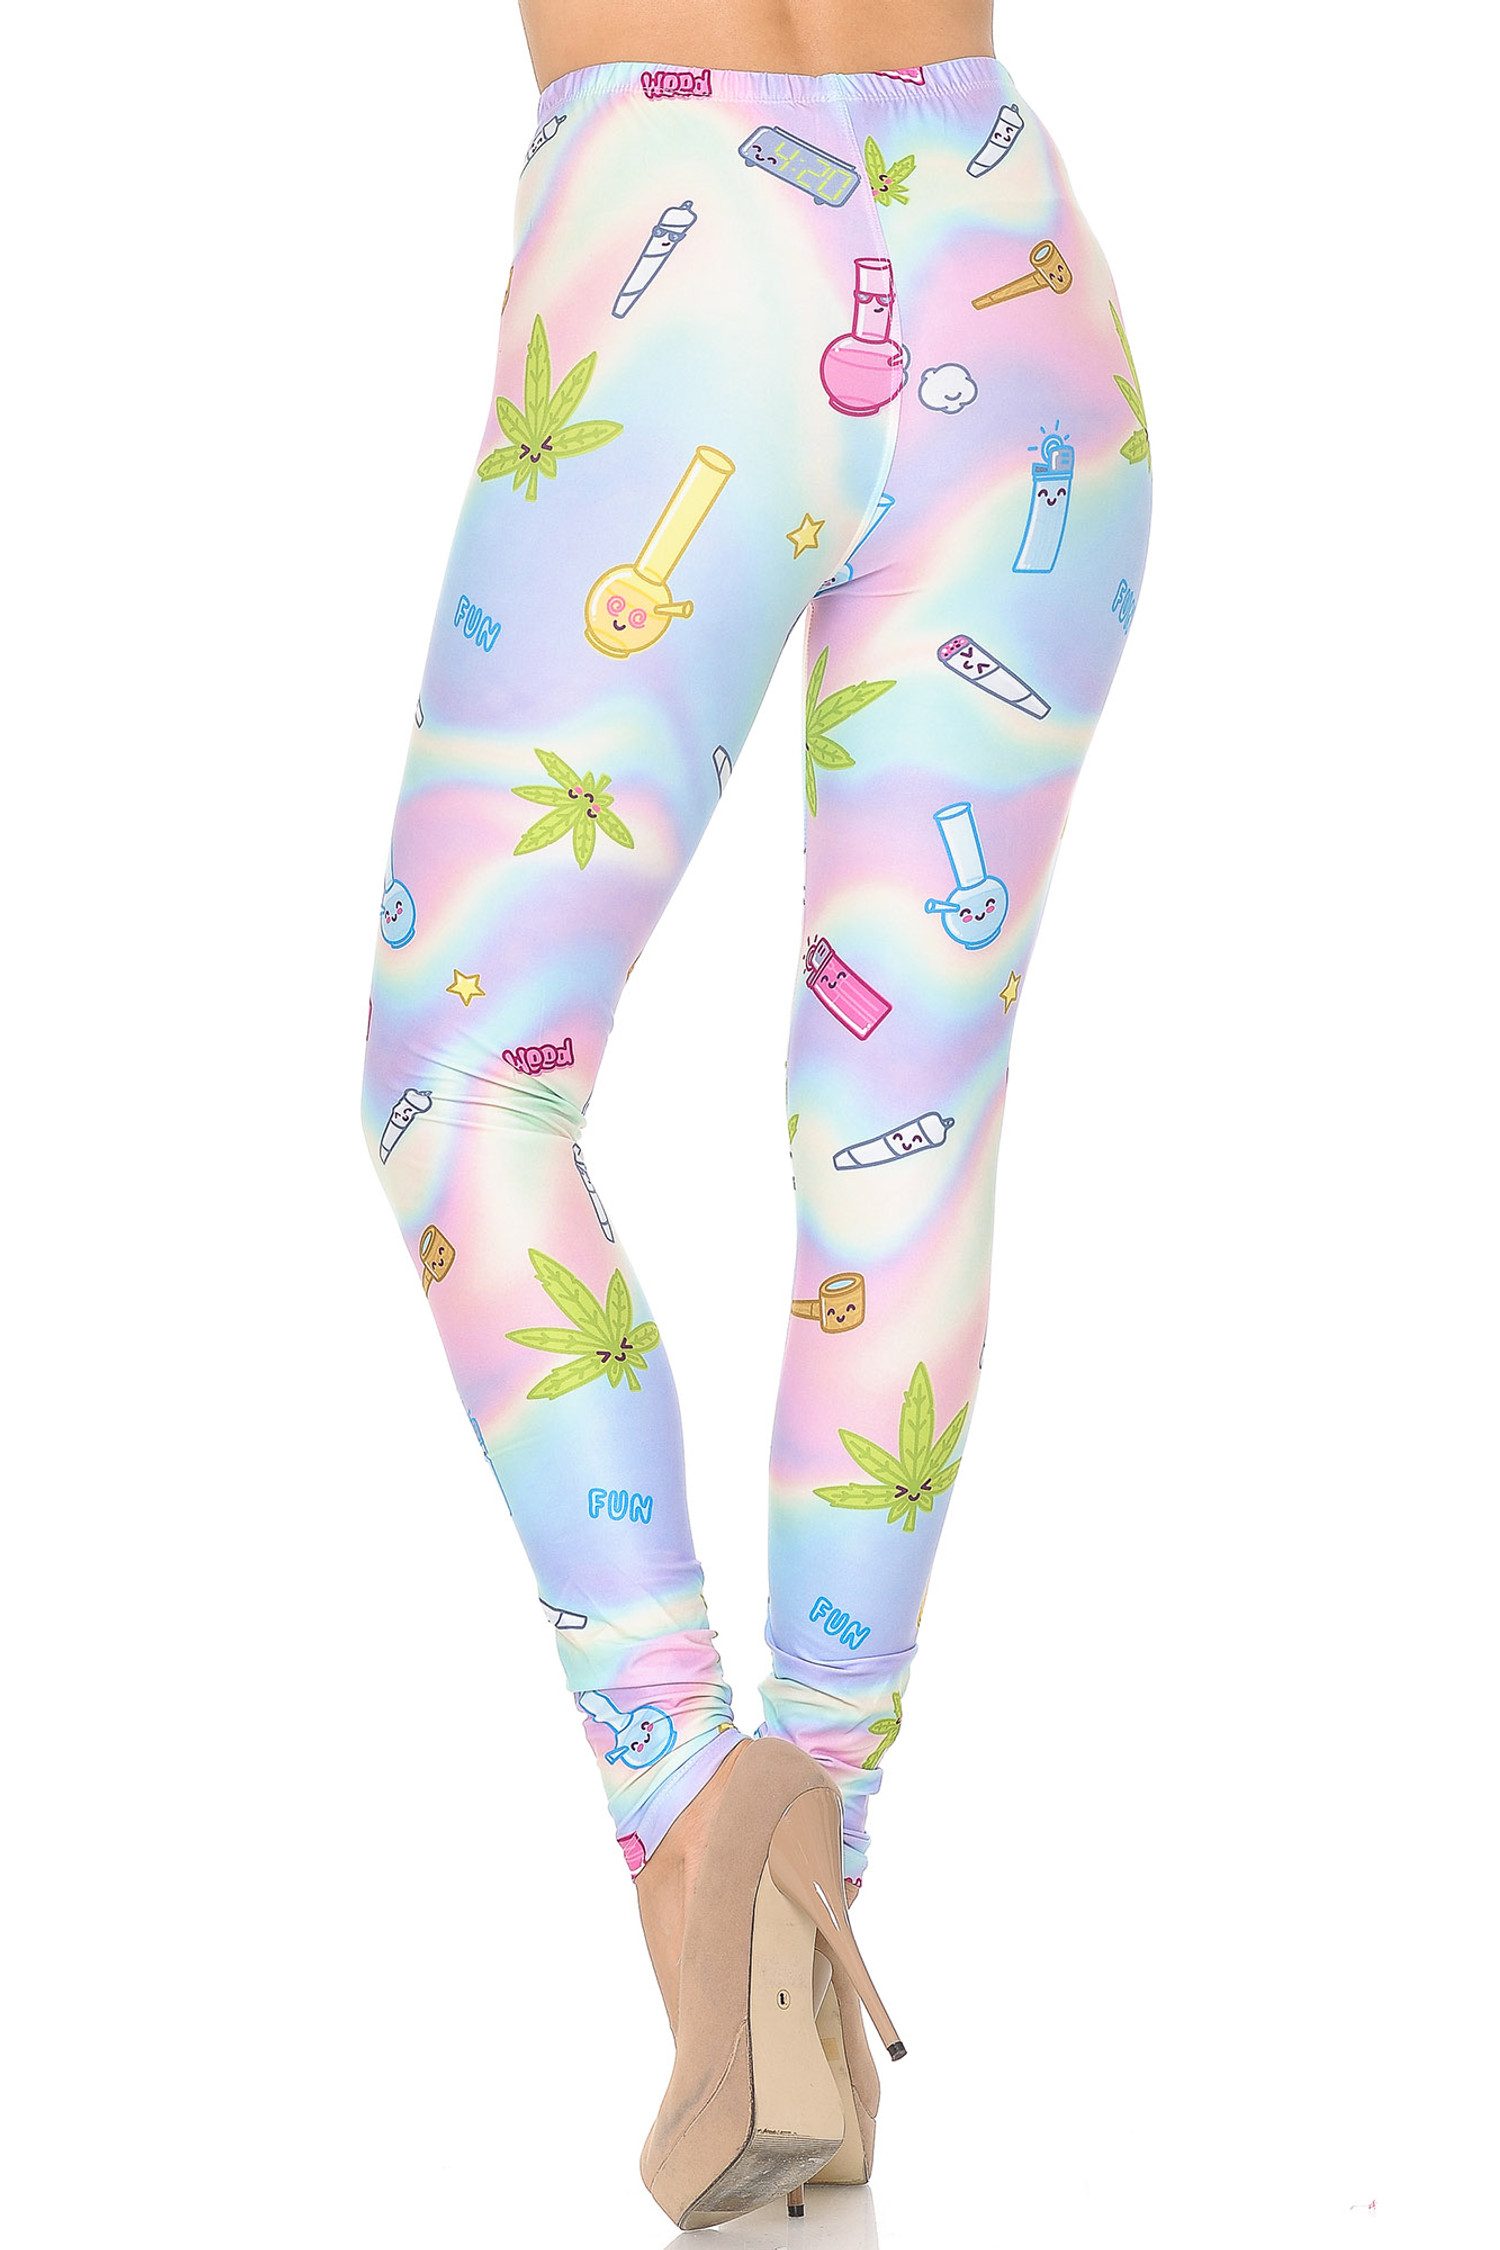 Creamy Soft Marijuana Life Leggings - USA Fashion™